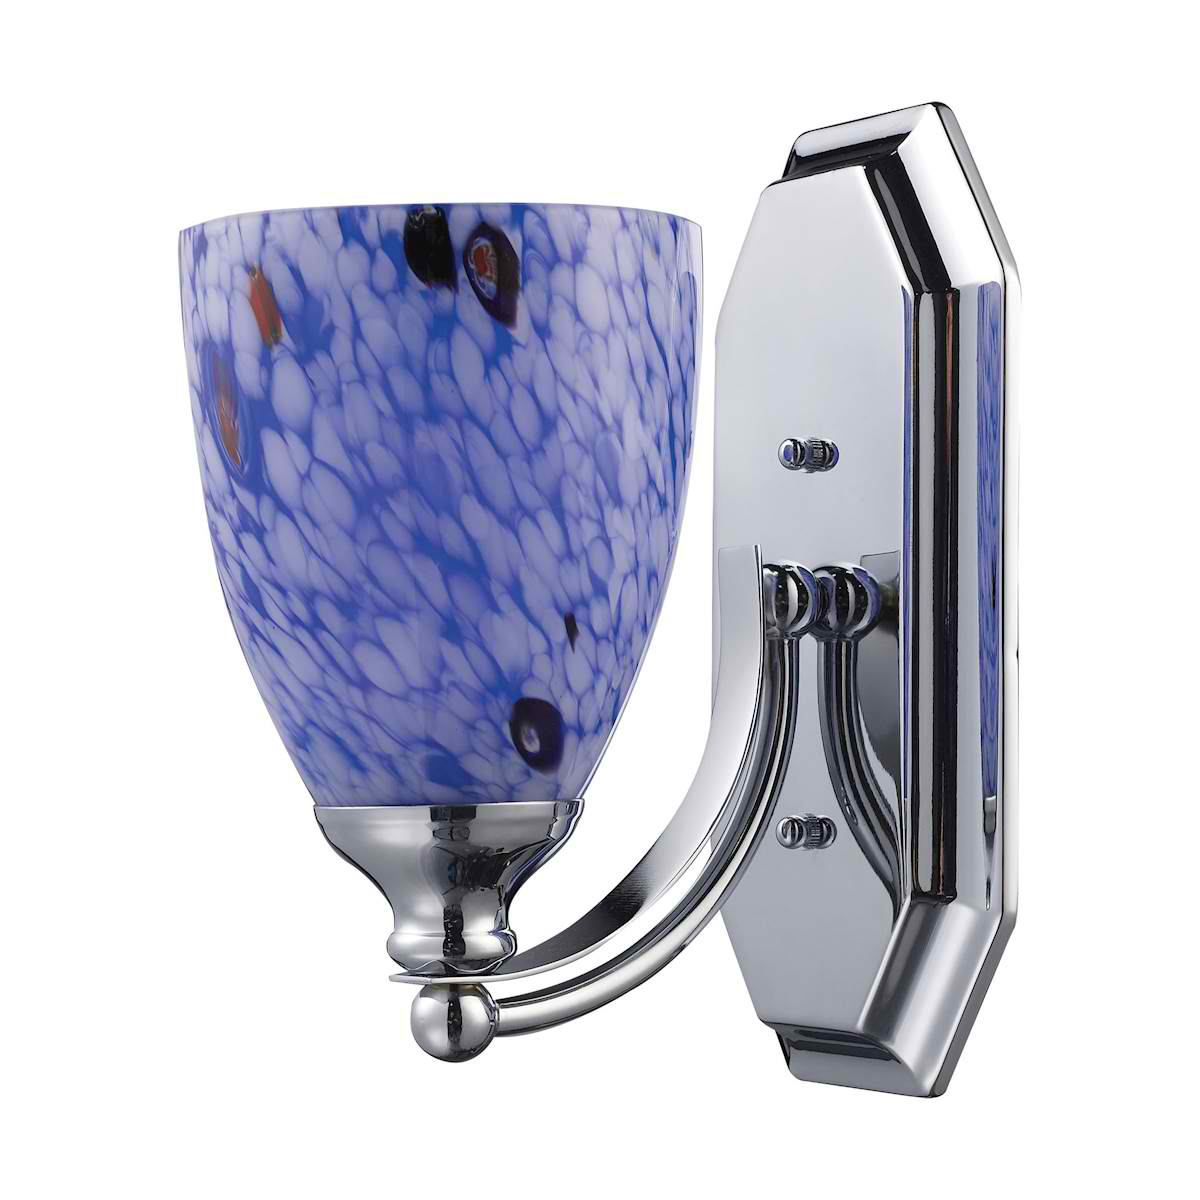 Vanity 1 Light Chrome Finish with Starburst Blue Glass